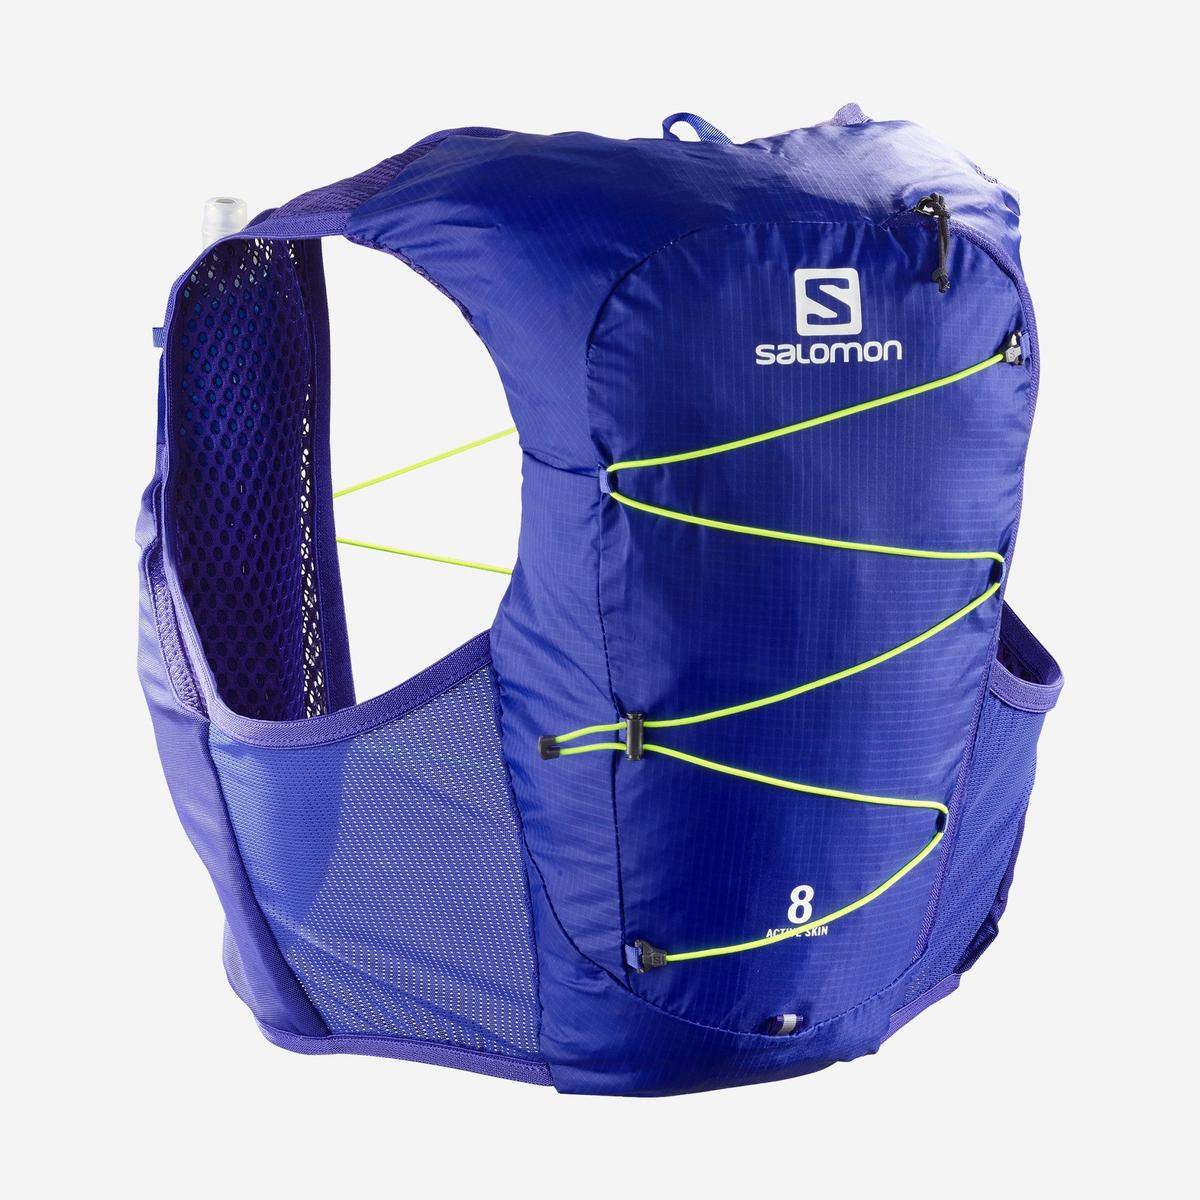 Salomon Active Skin 8 - Clematis Blue / Safety Yellow